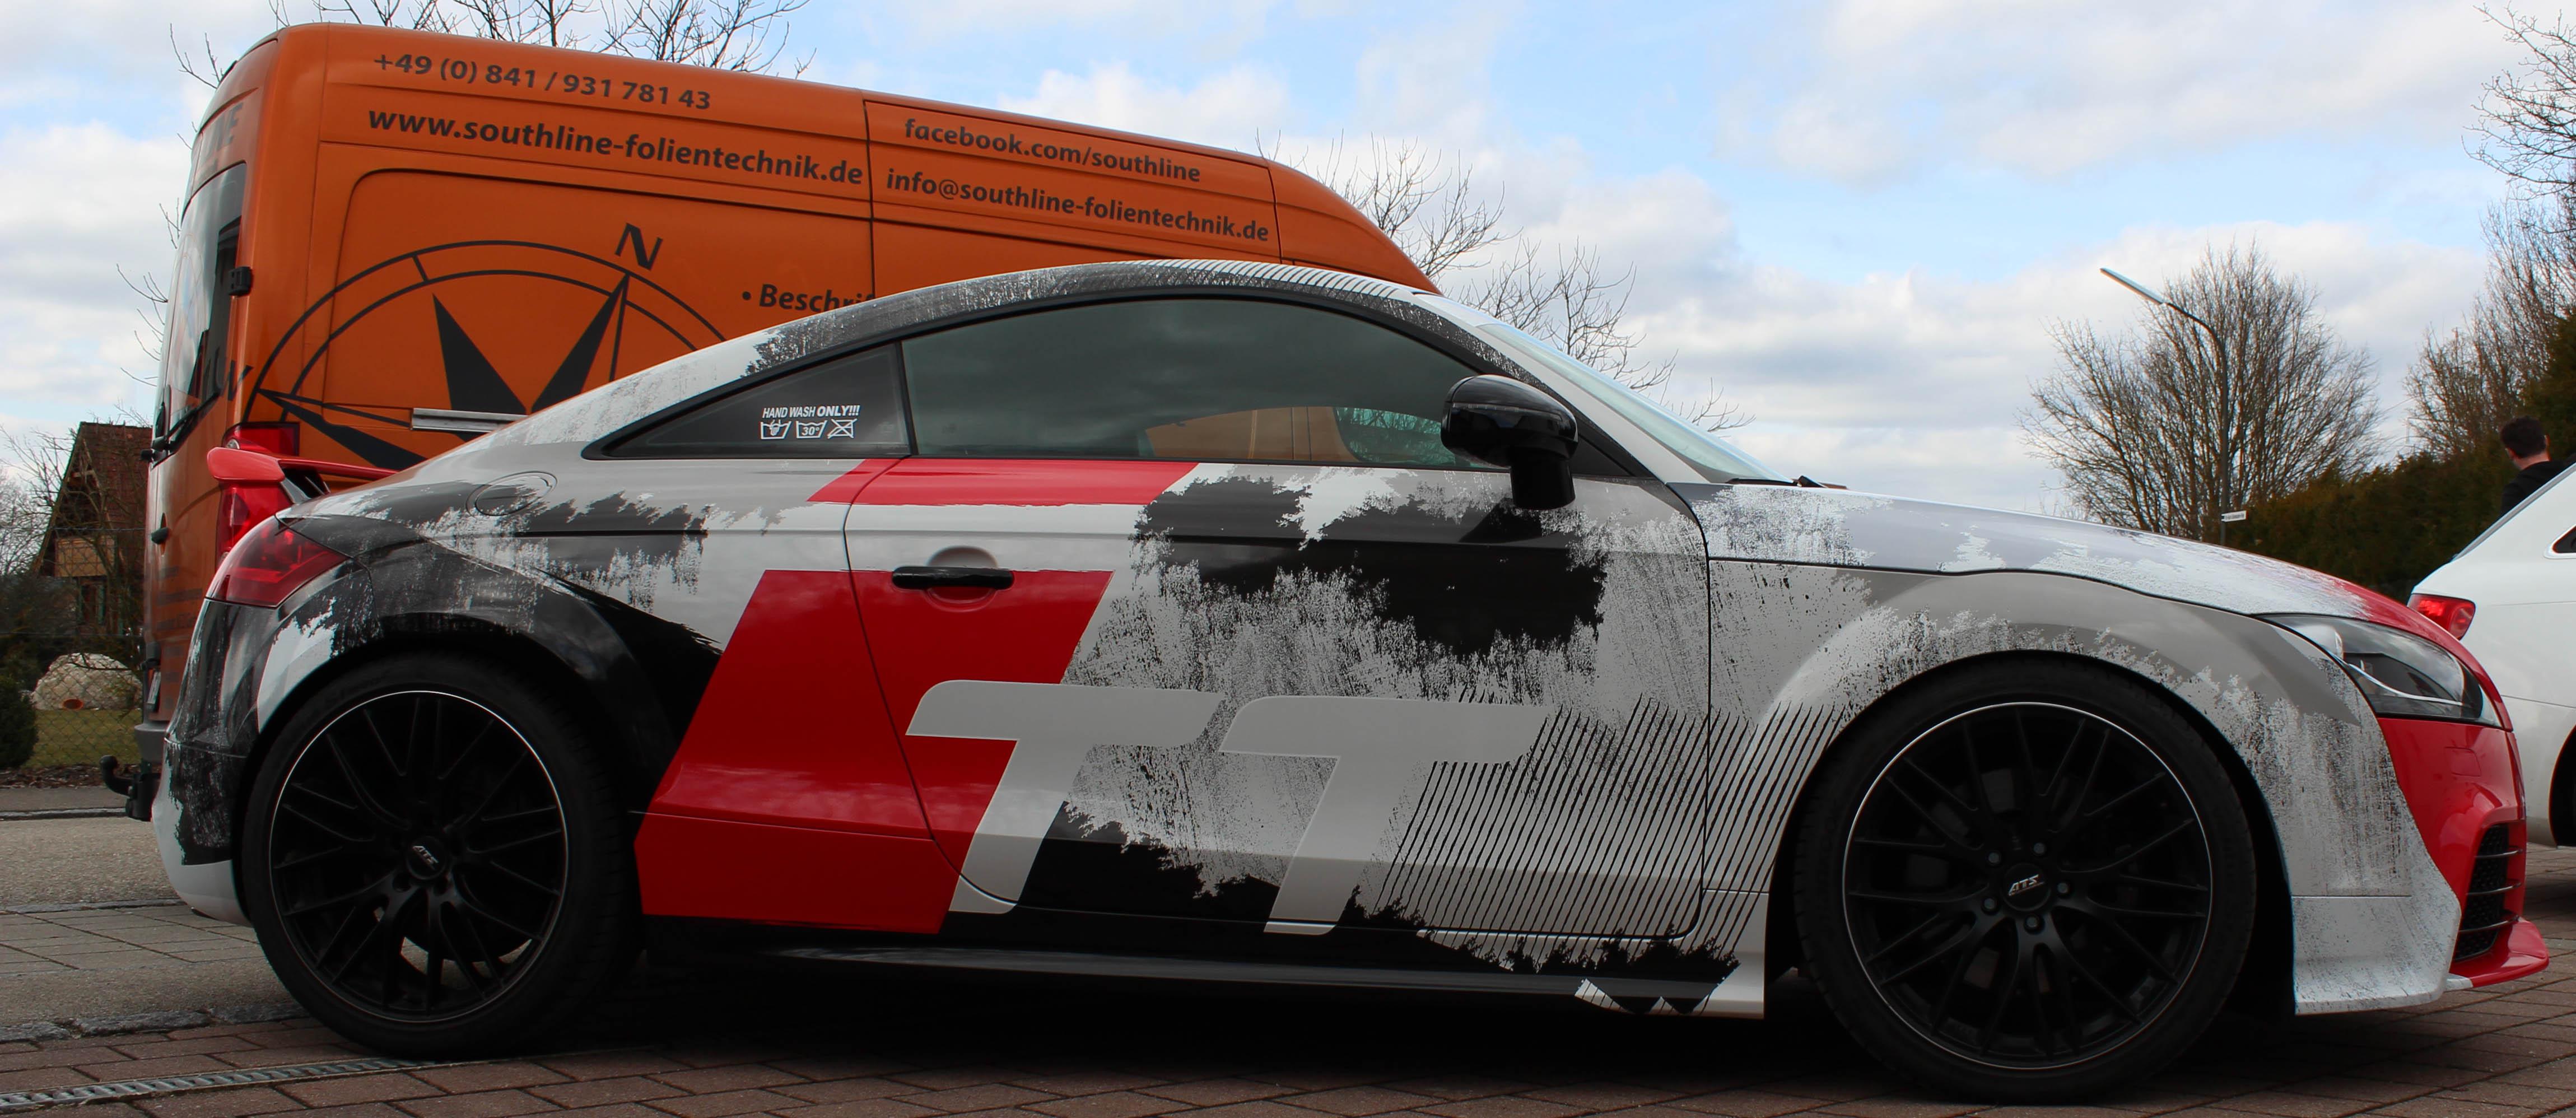 audi_tt_tuning_design_car_wrap_folie_21